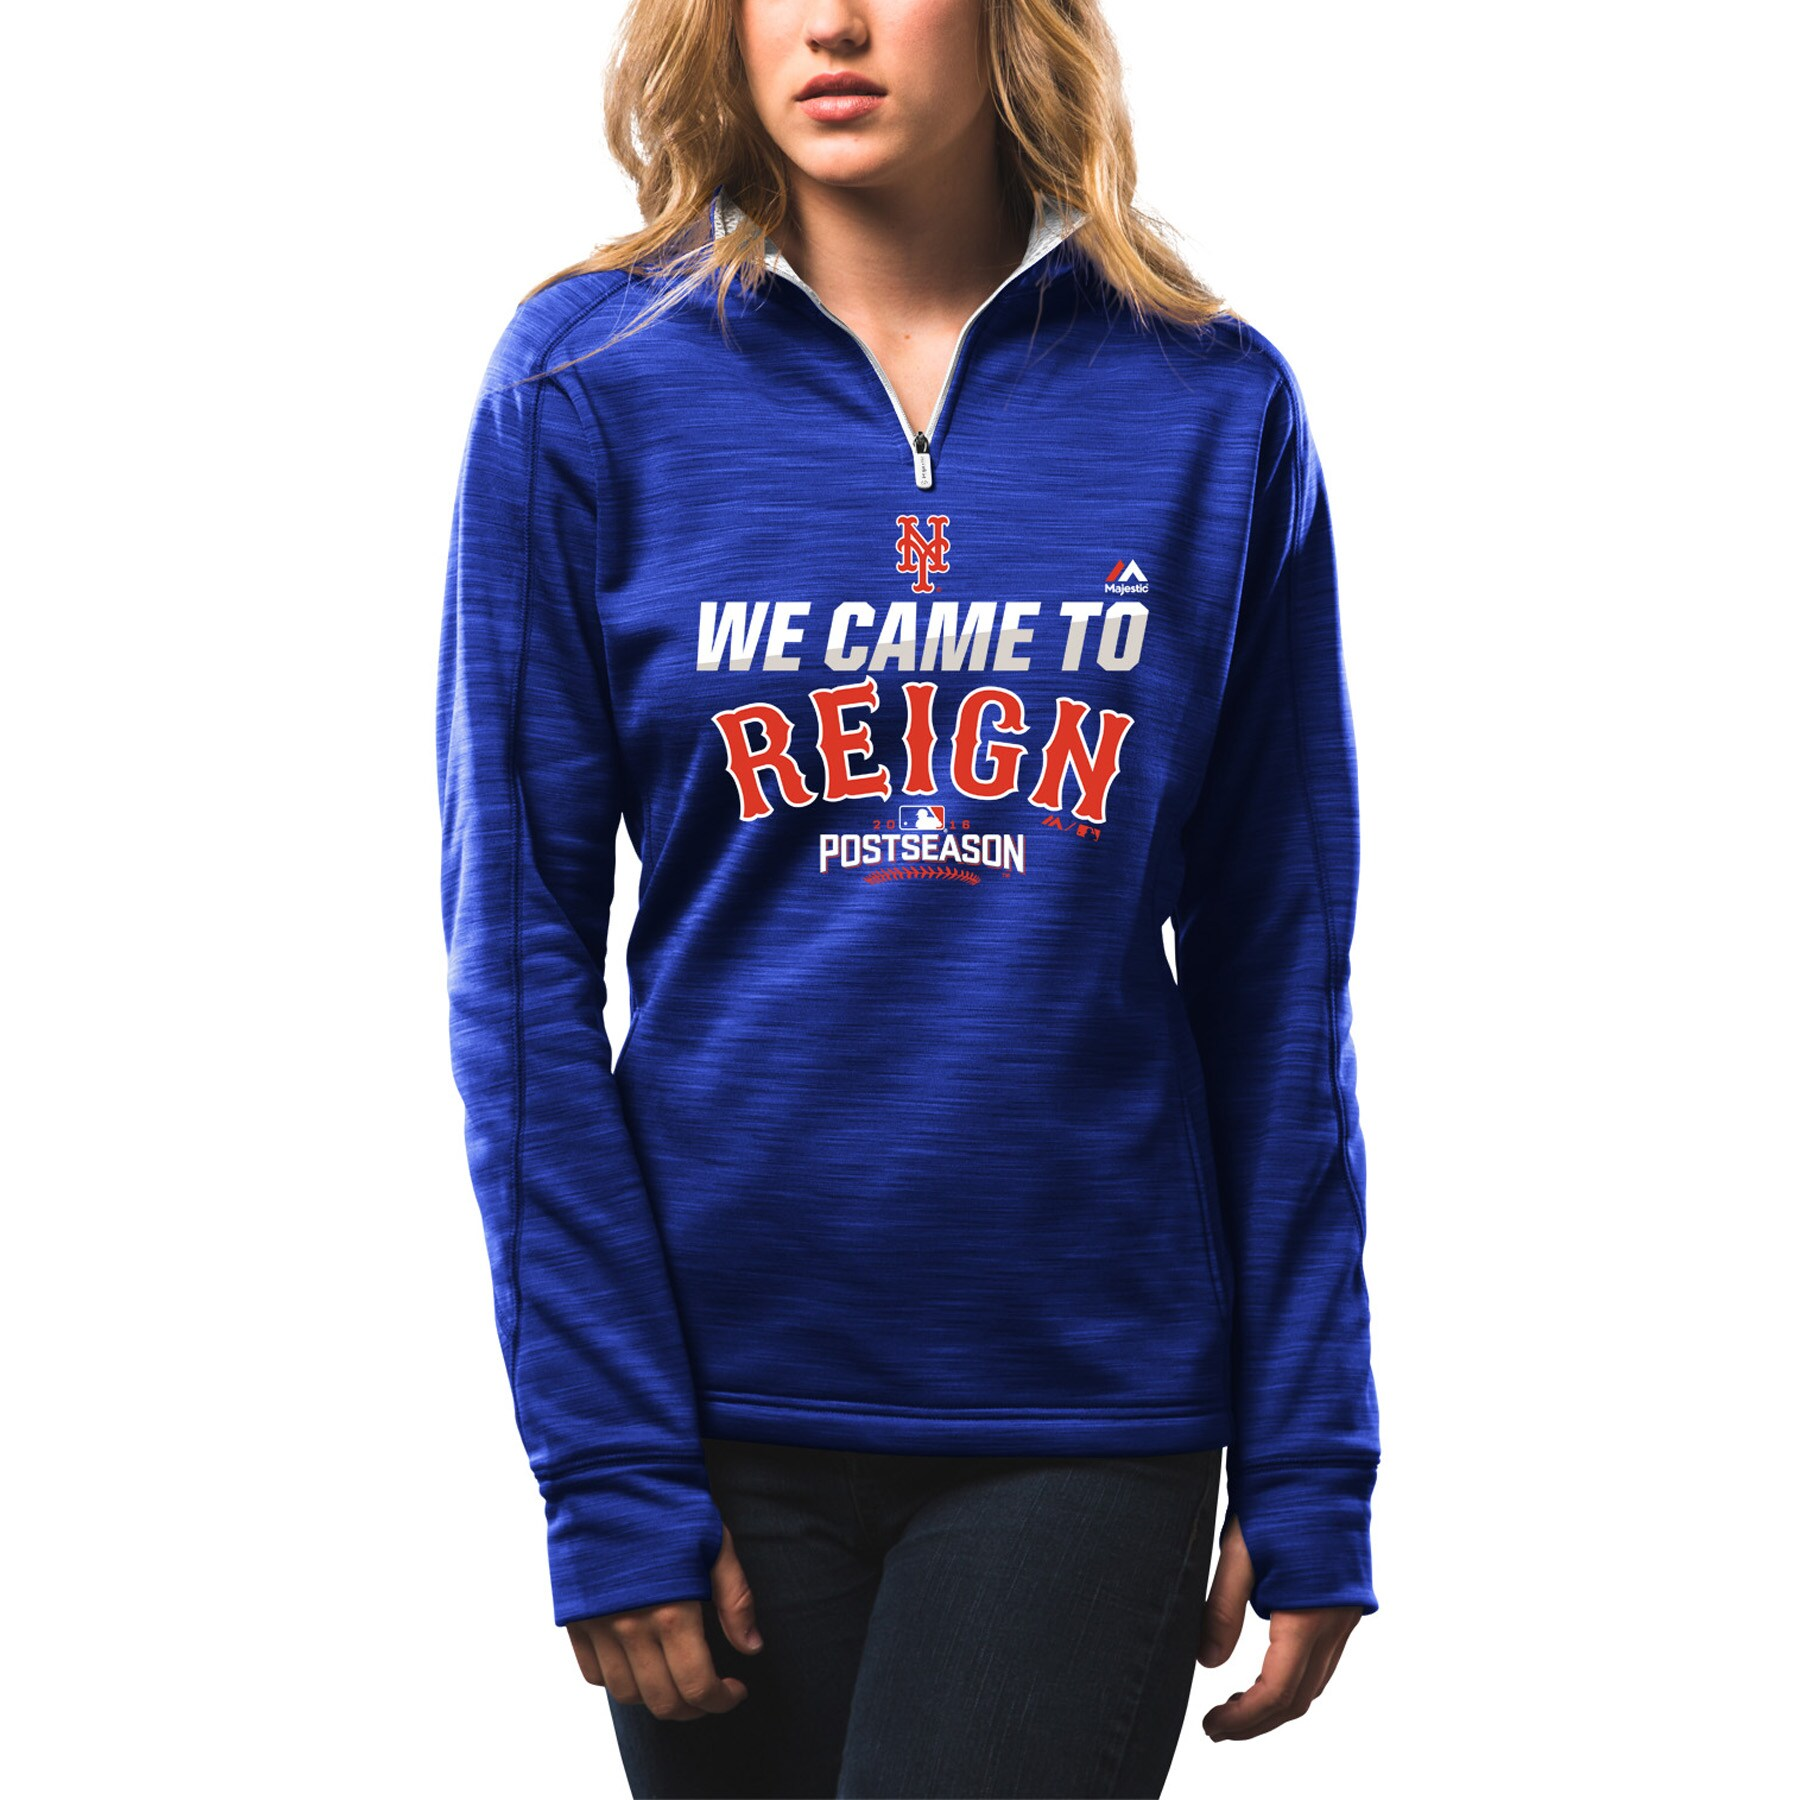 New York Mets Women's 2016 Postseason Participant We Came to Reign Quarter-Zip Streak Fleece - Royal